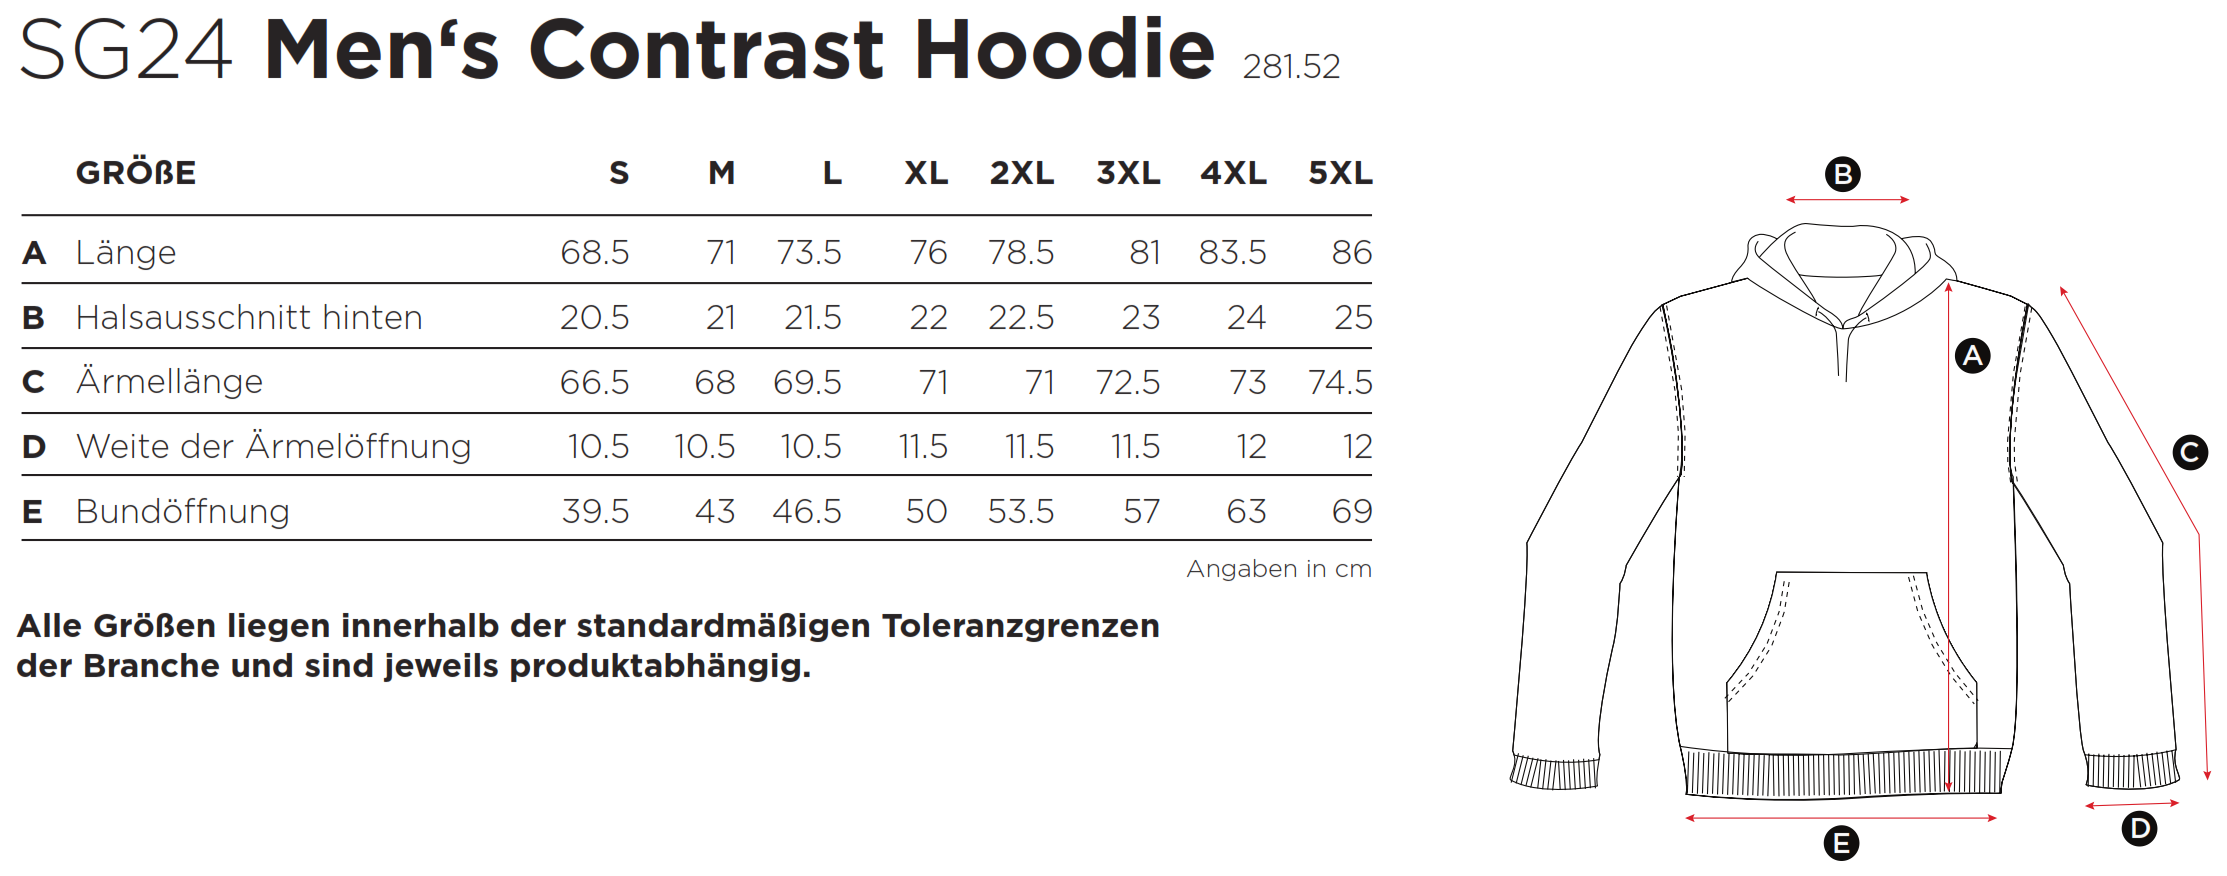 SG: Contrast Hoodie SG24